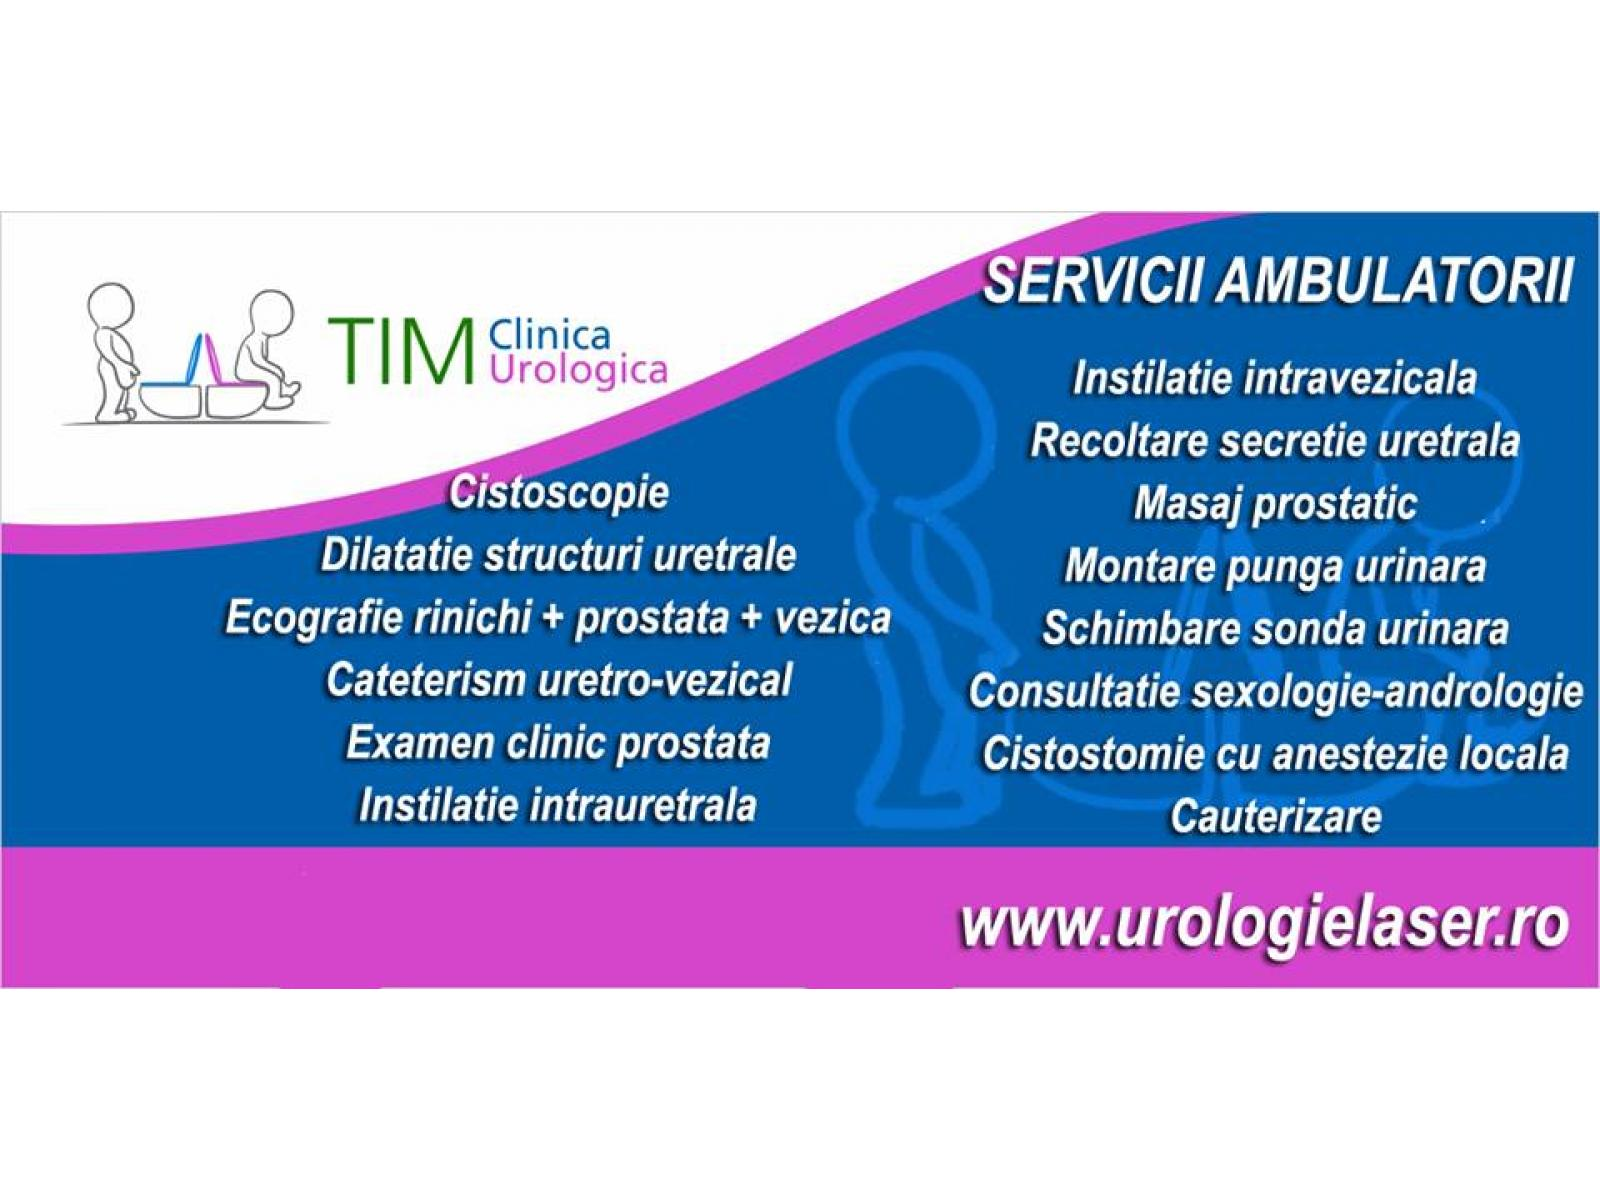 Urologie Timisoara - RECLAMA_1.jpg